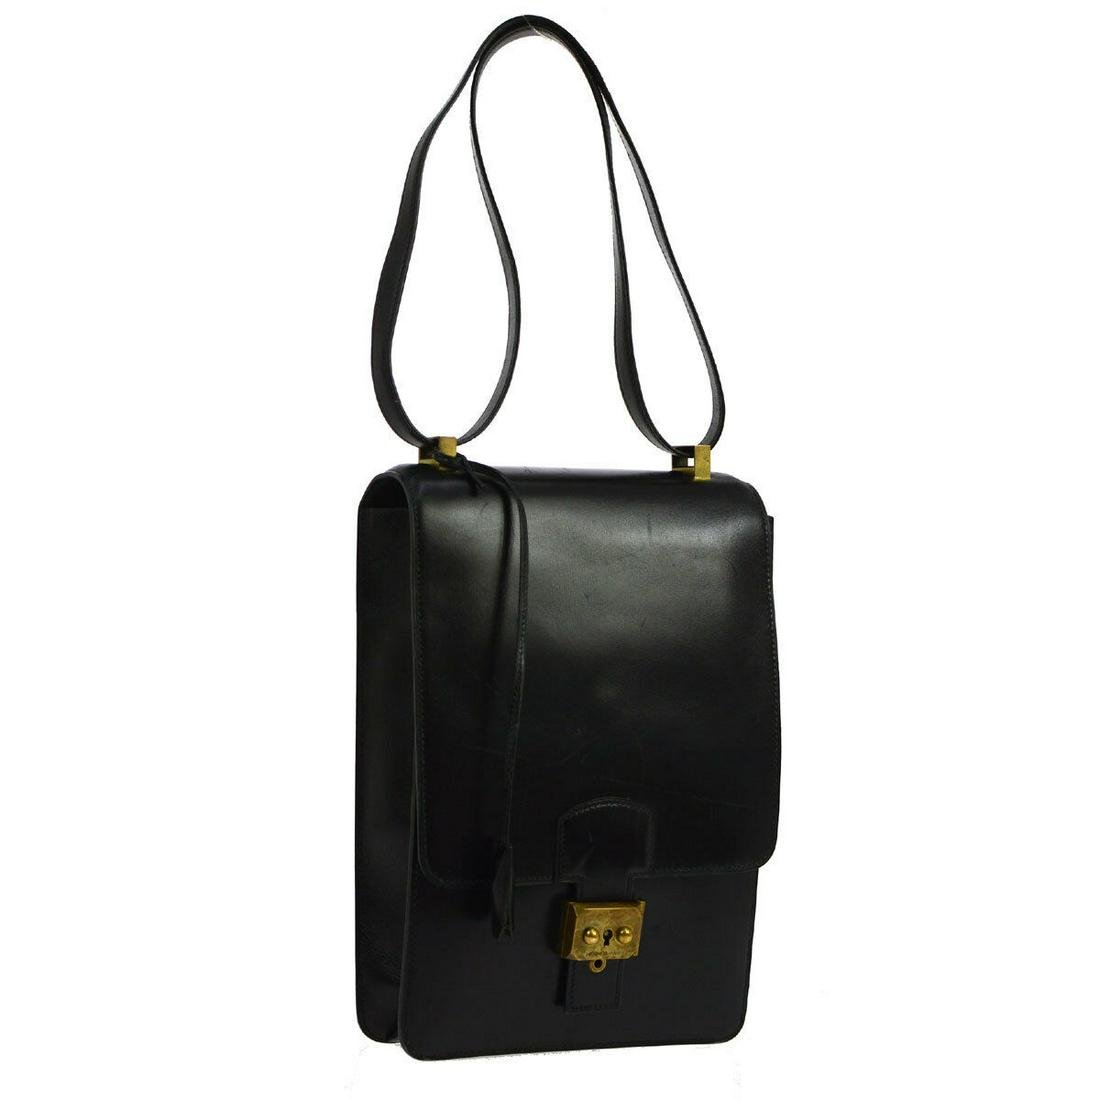 Authentic HERMES Box Calf Shoulder Bag